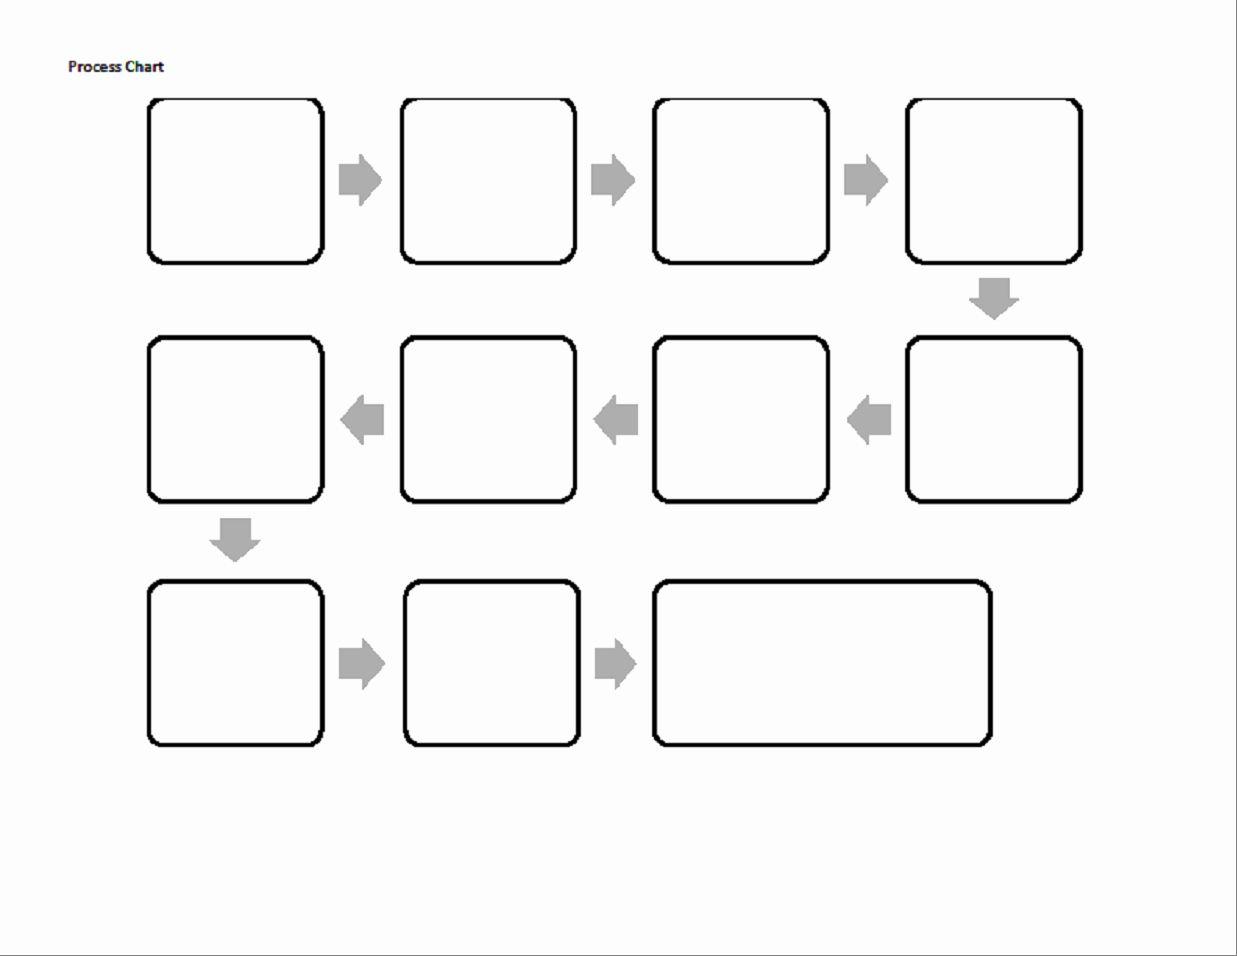 Blank Flow Chart Template Elegant Process Chart Blank 150